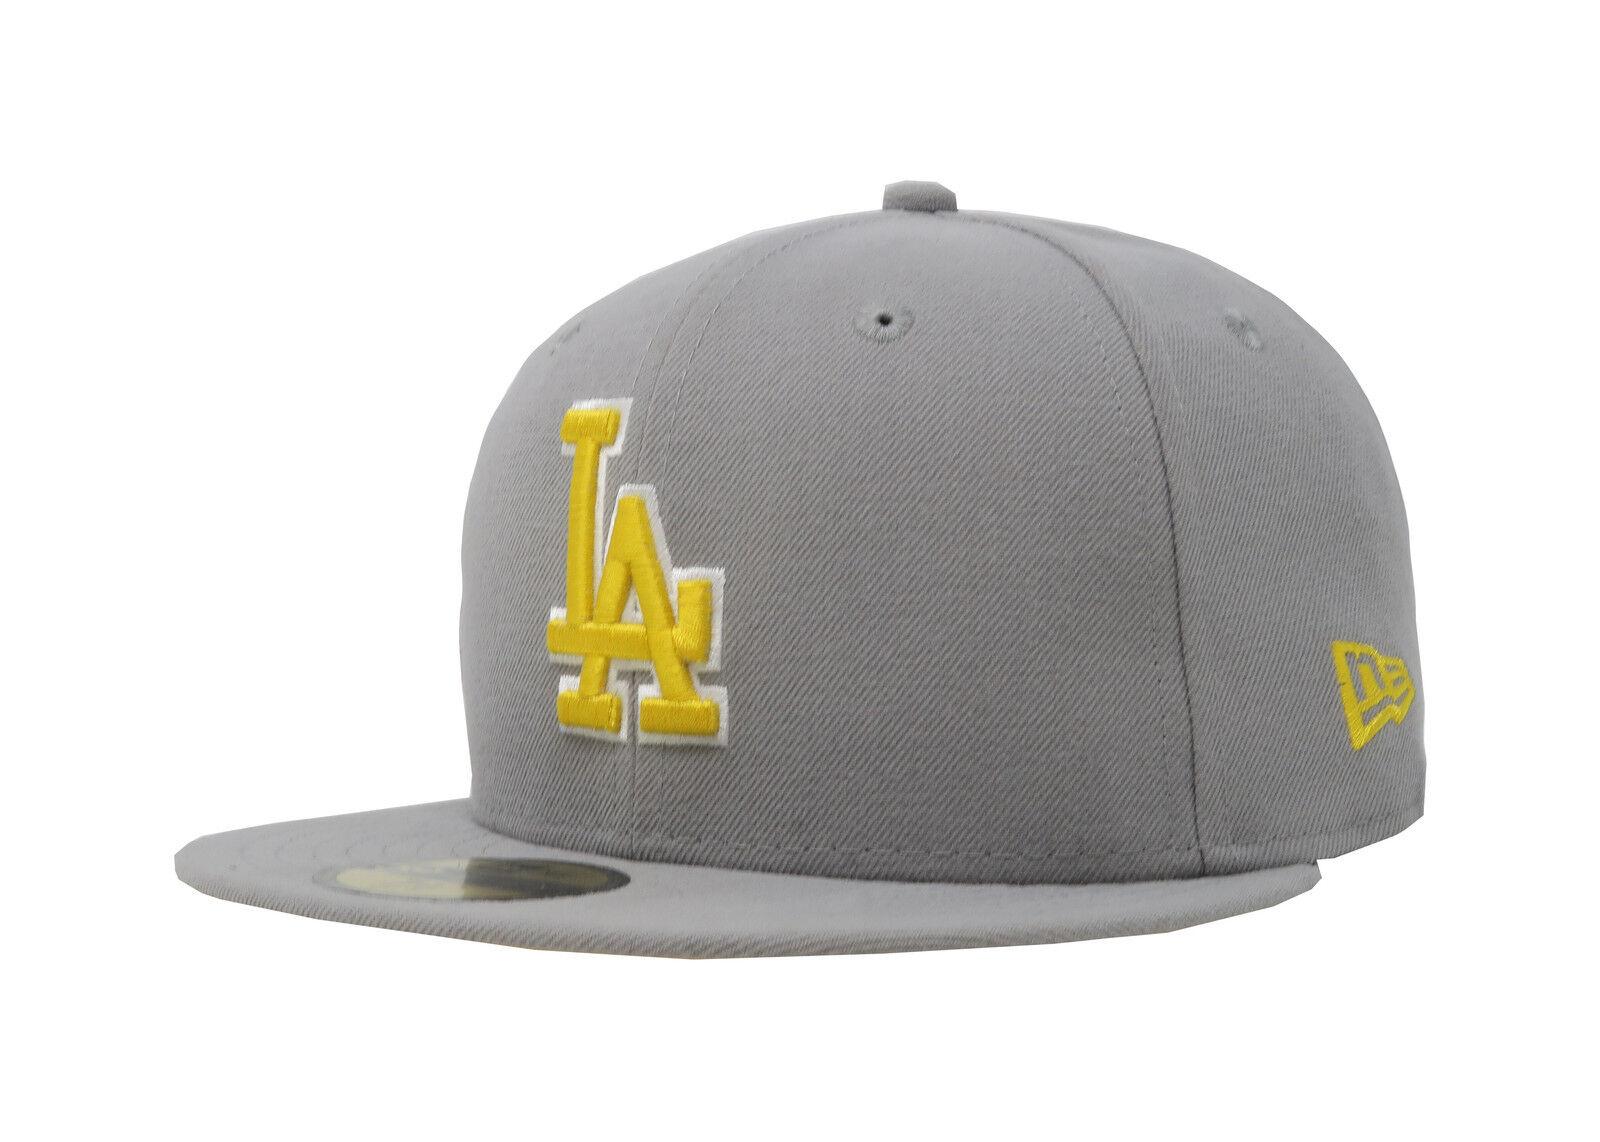 New Womens Era 59Fifty Hat MLB Los Angeles Dodgers Mens Womens New Gray Yellow 5950 Cap 1af8d5